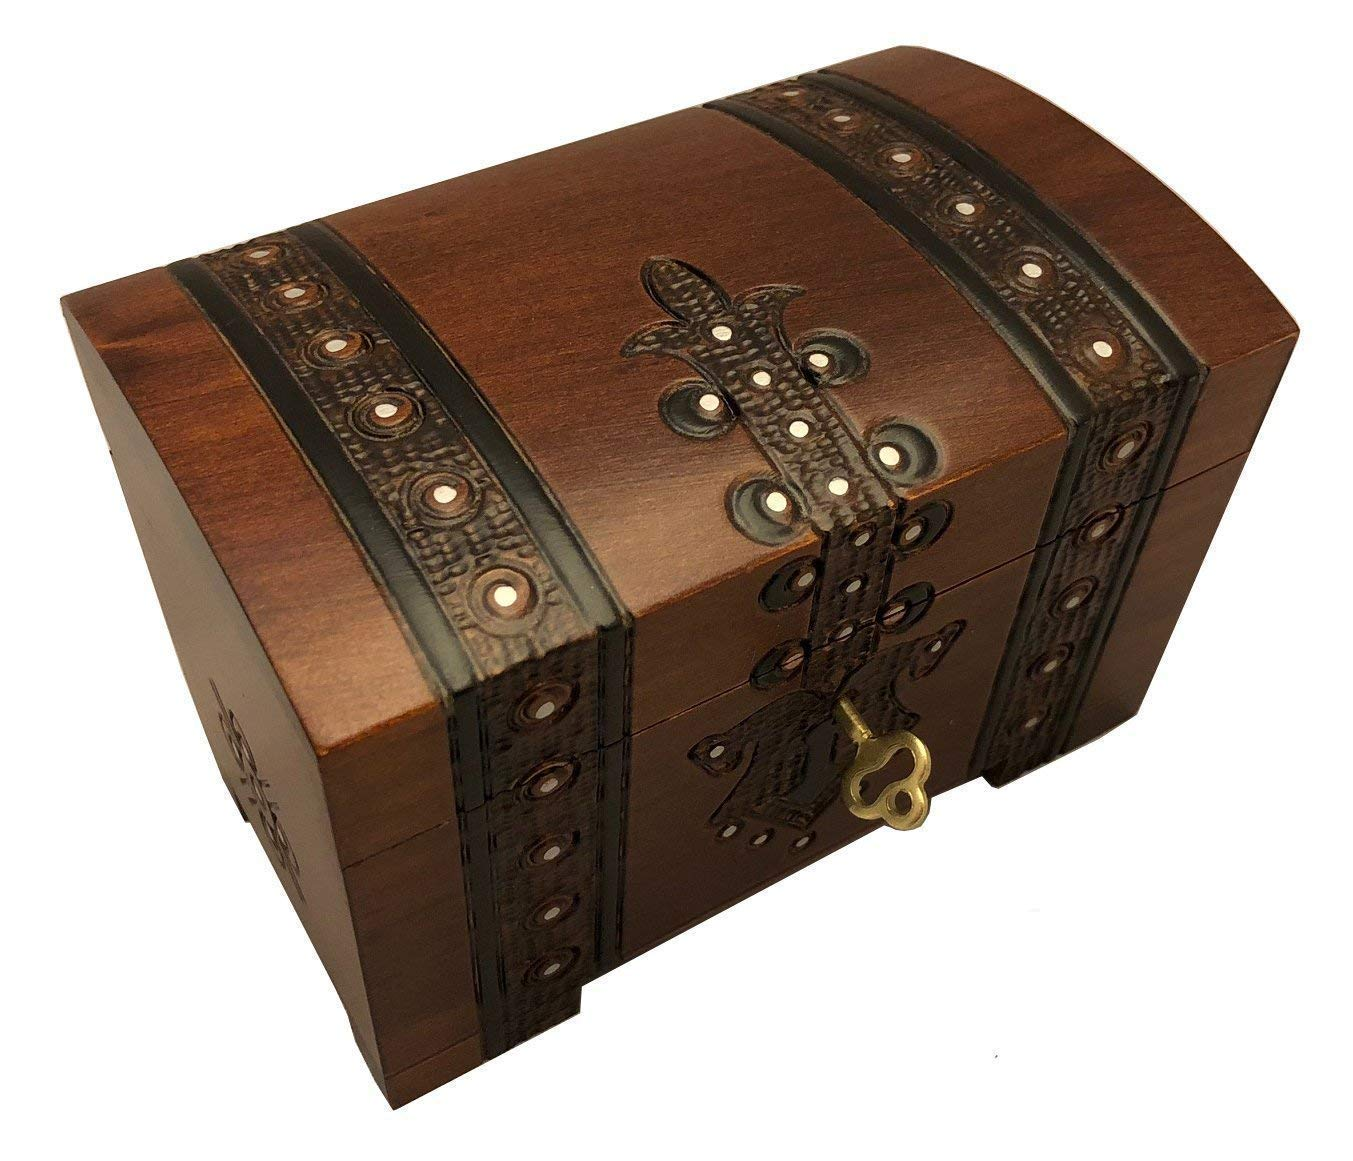 Handmade Wooden Chest Box w/Lock and Key Polish Linden Wood Jewelry Keepsake